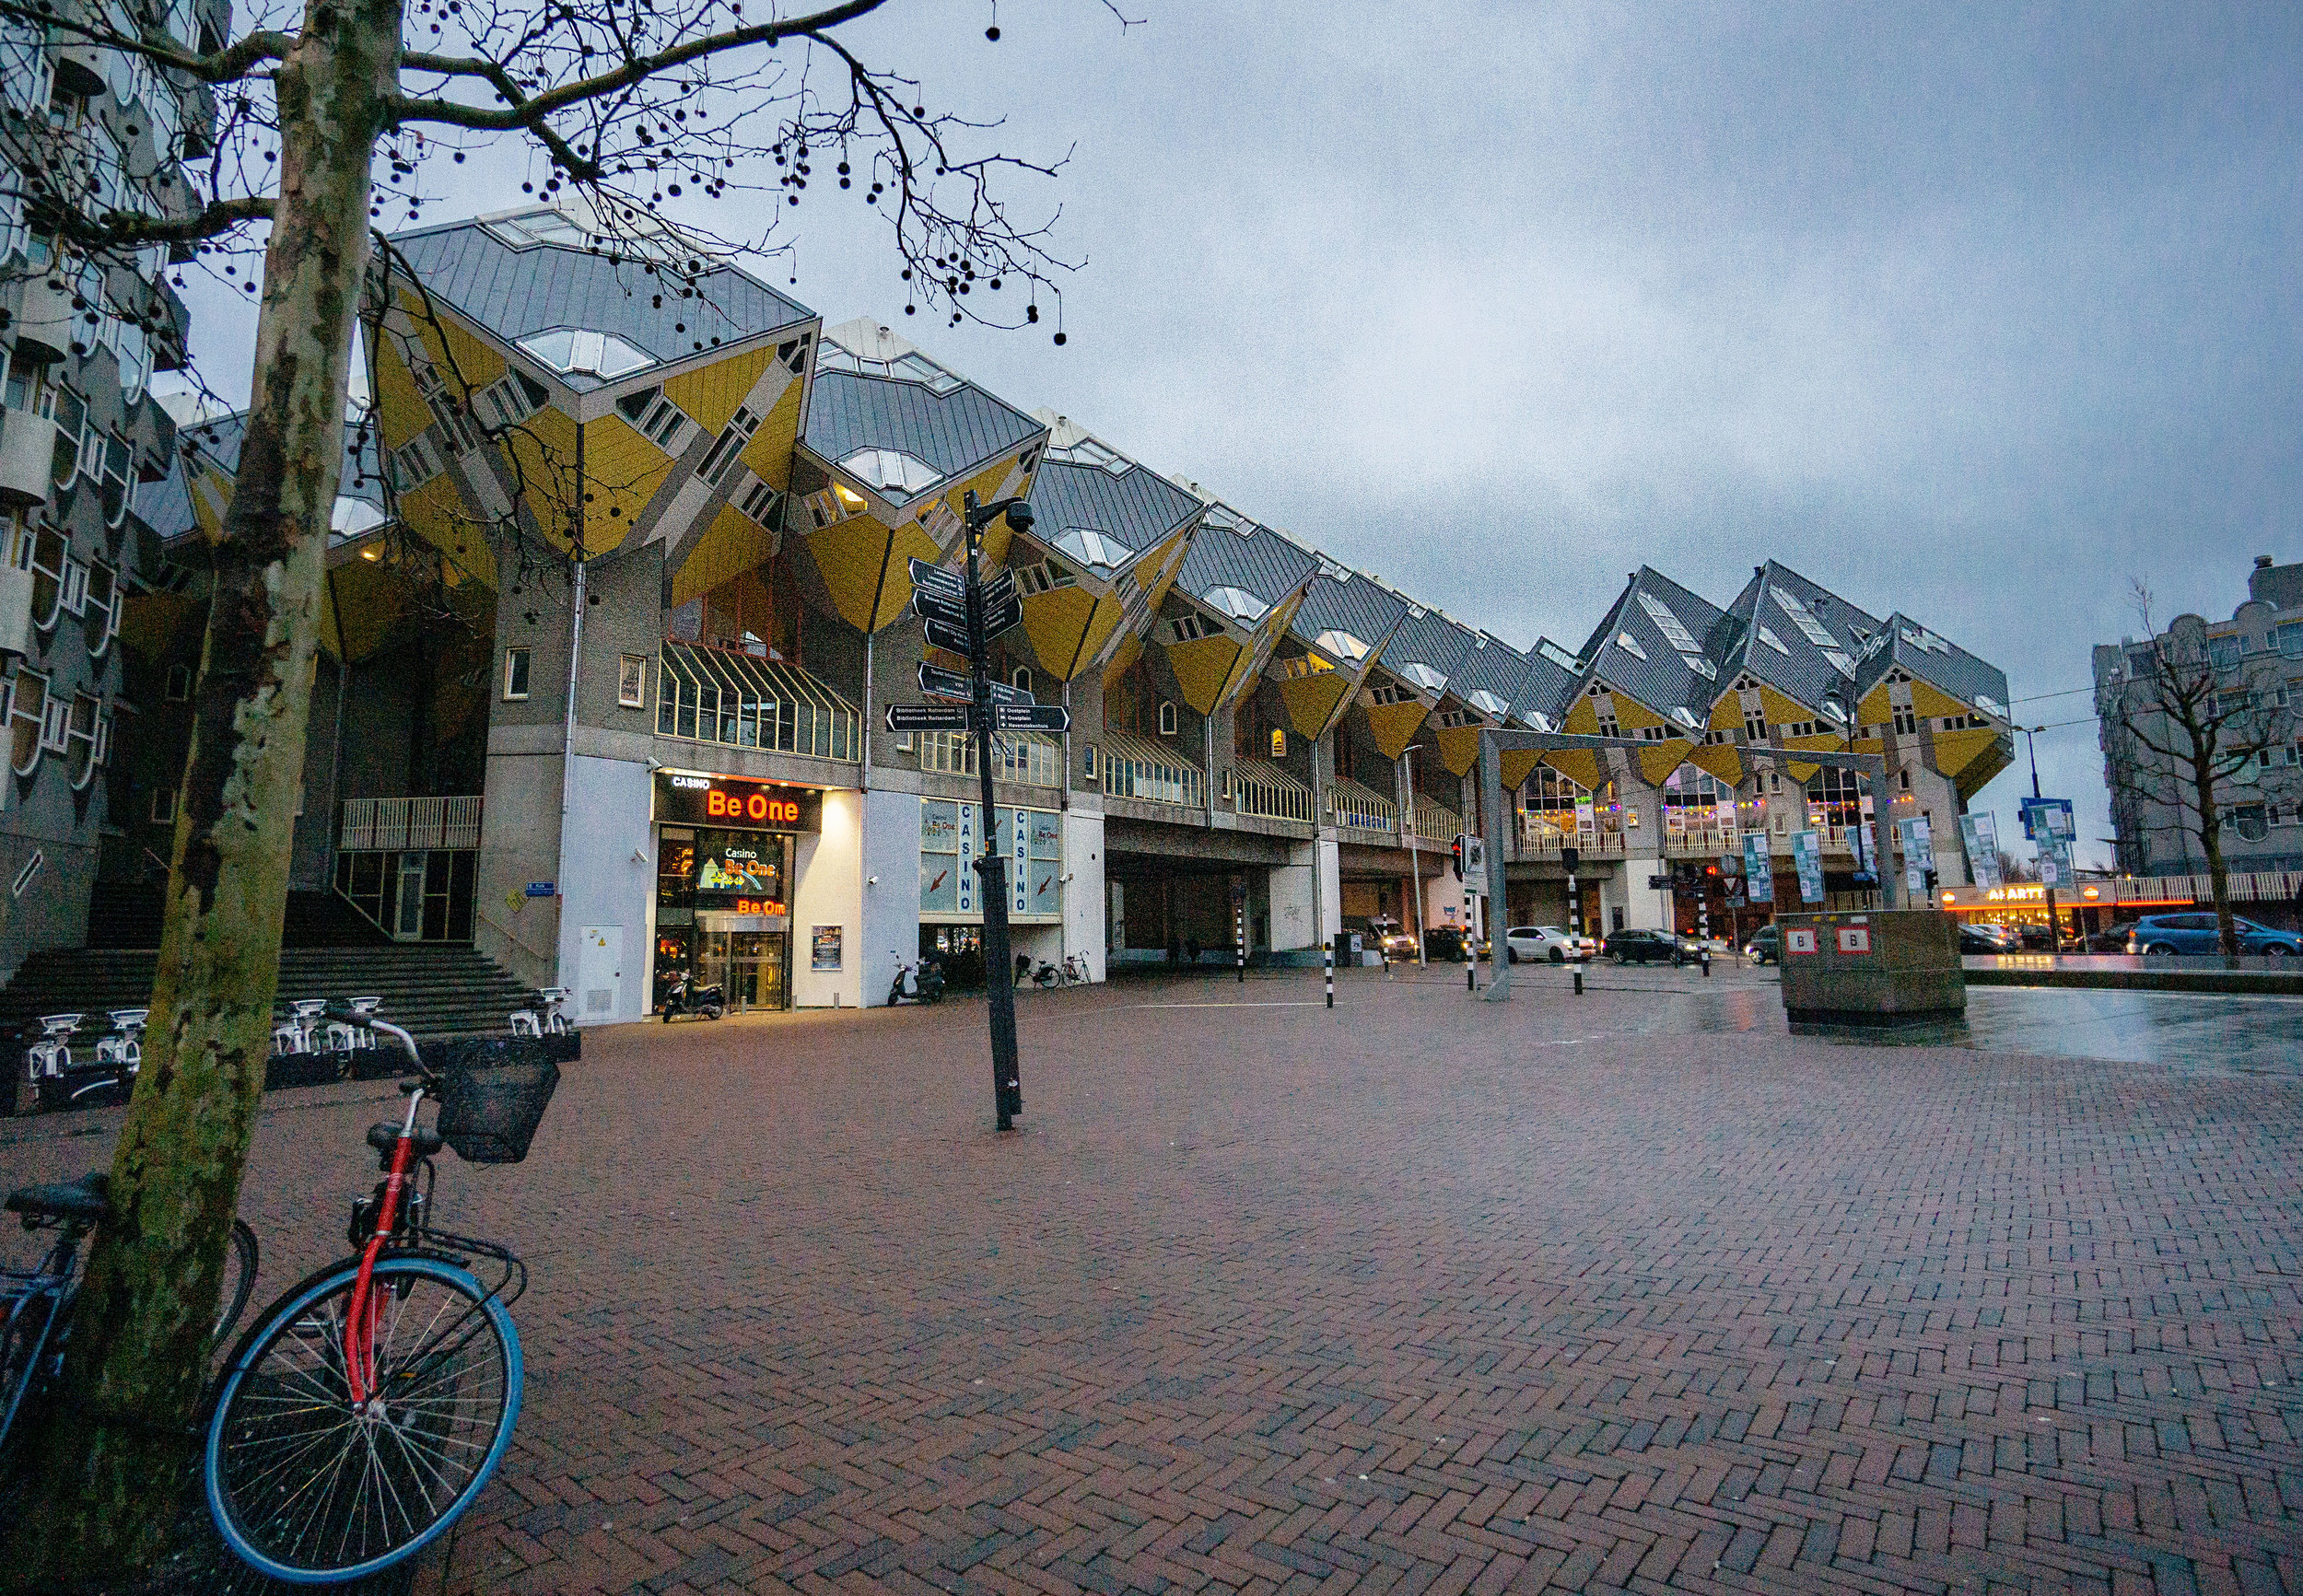 rotterdam_theNetherlands_vickygood_travel_photogrpahy_sm.jpg